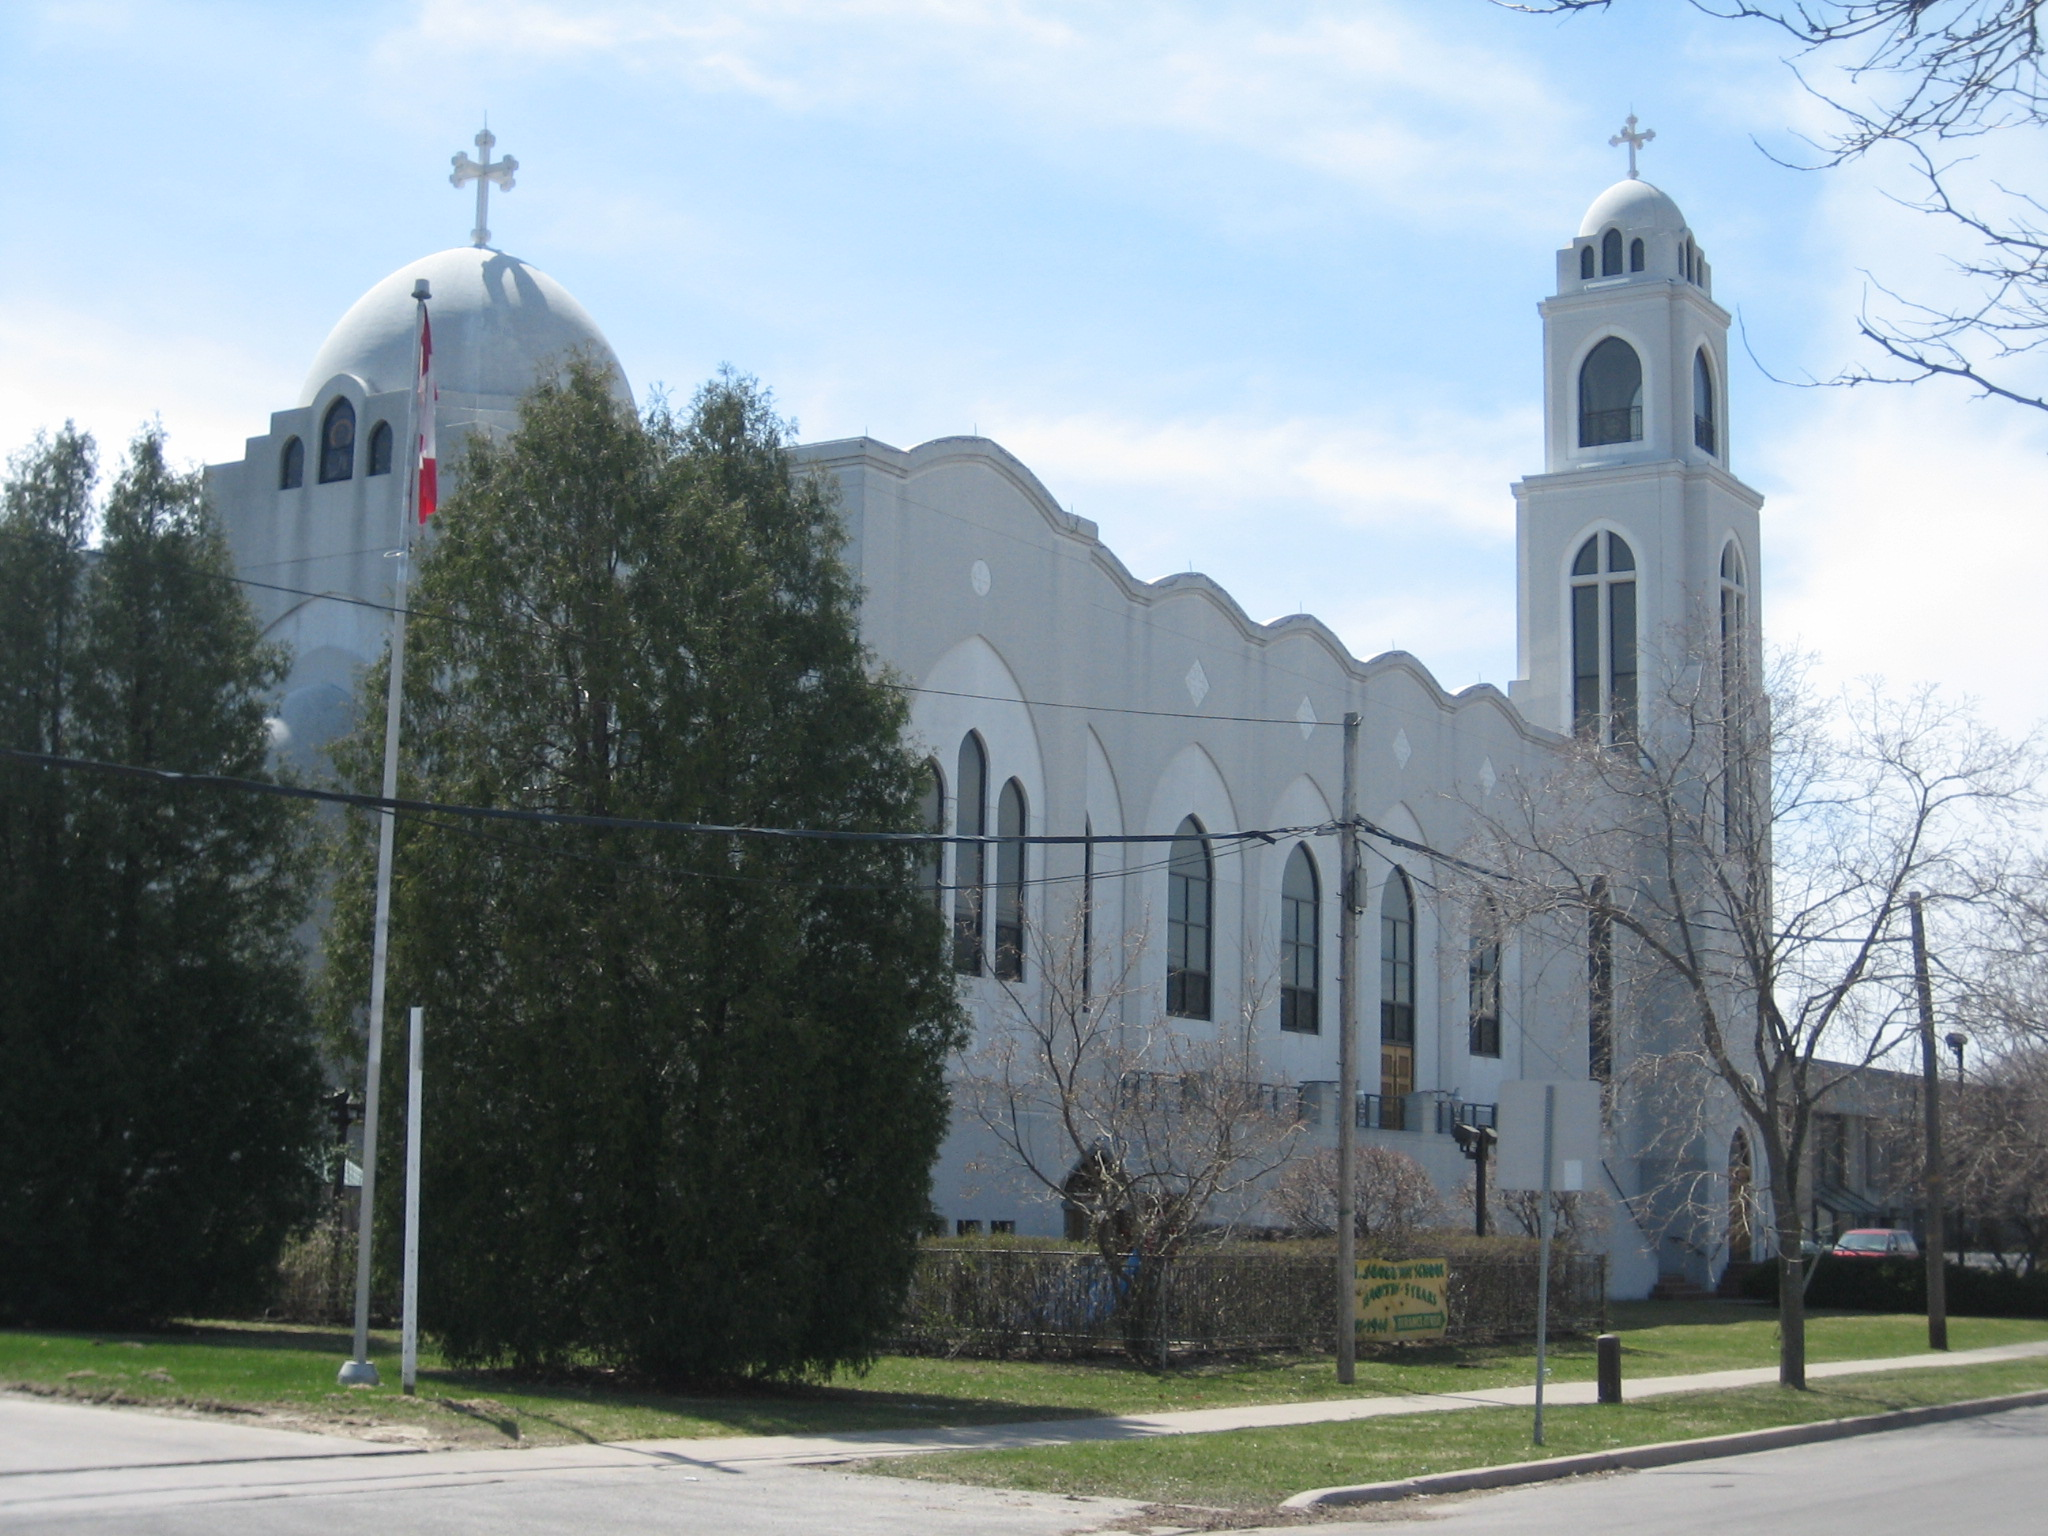 Coptic Orthodox Church in Japan Coptic Orthodox Church in